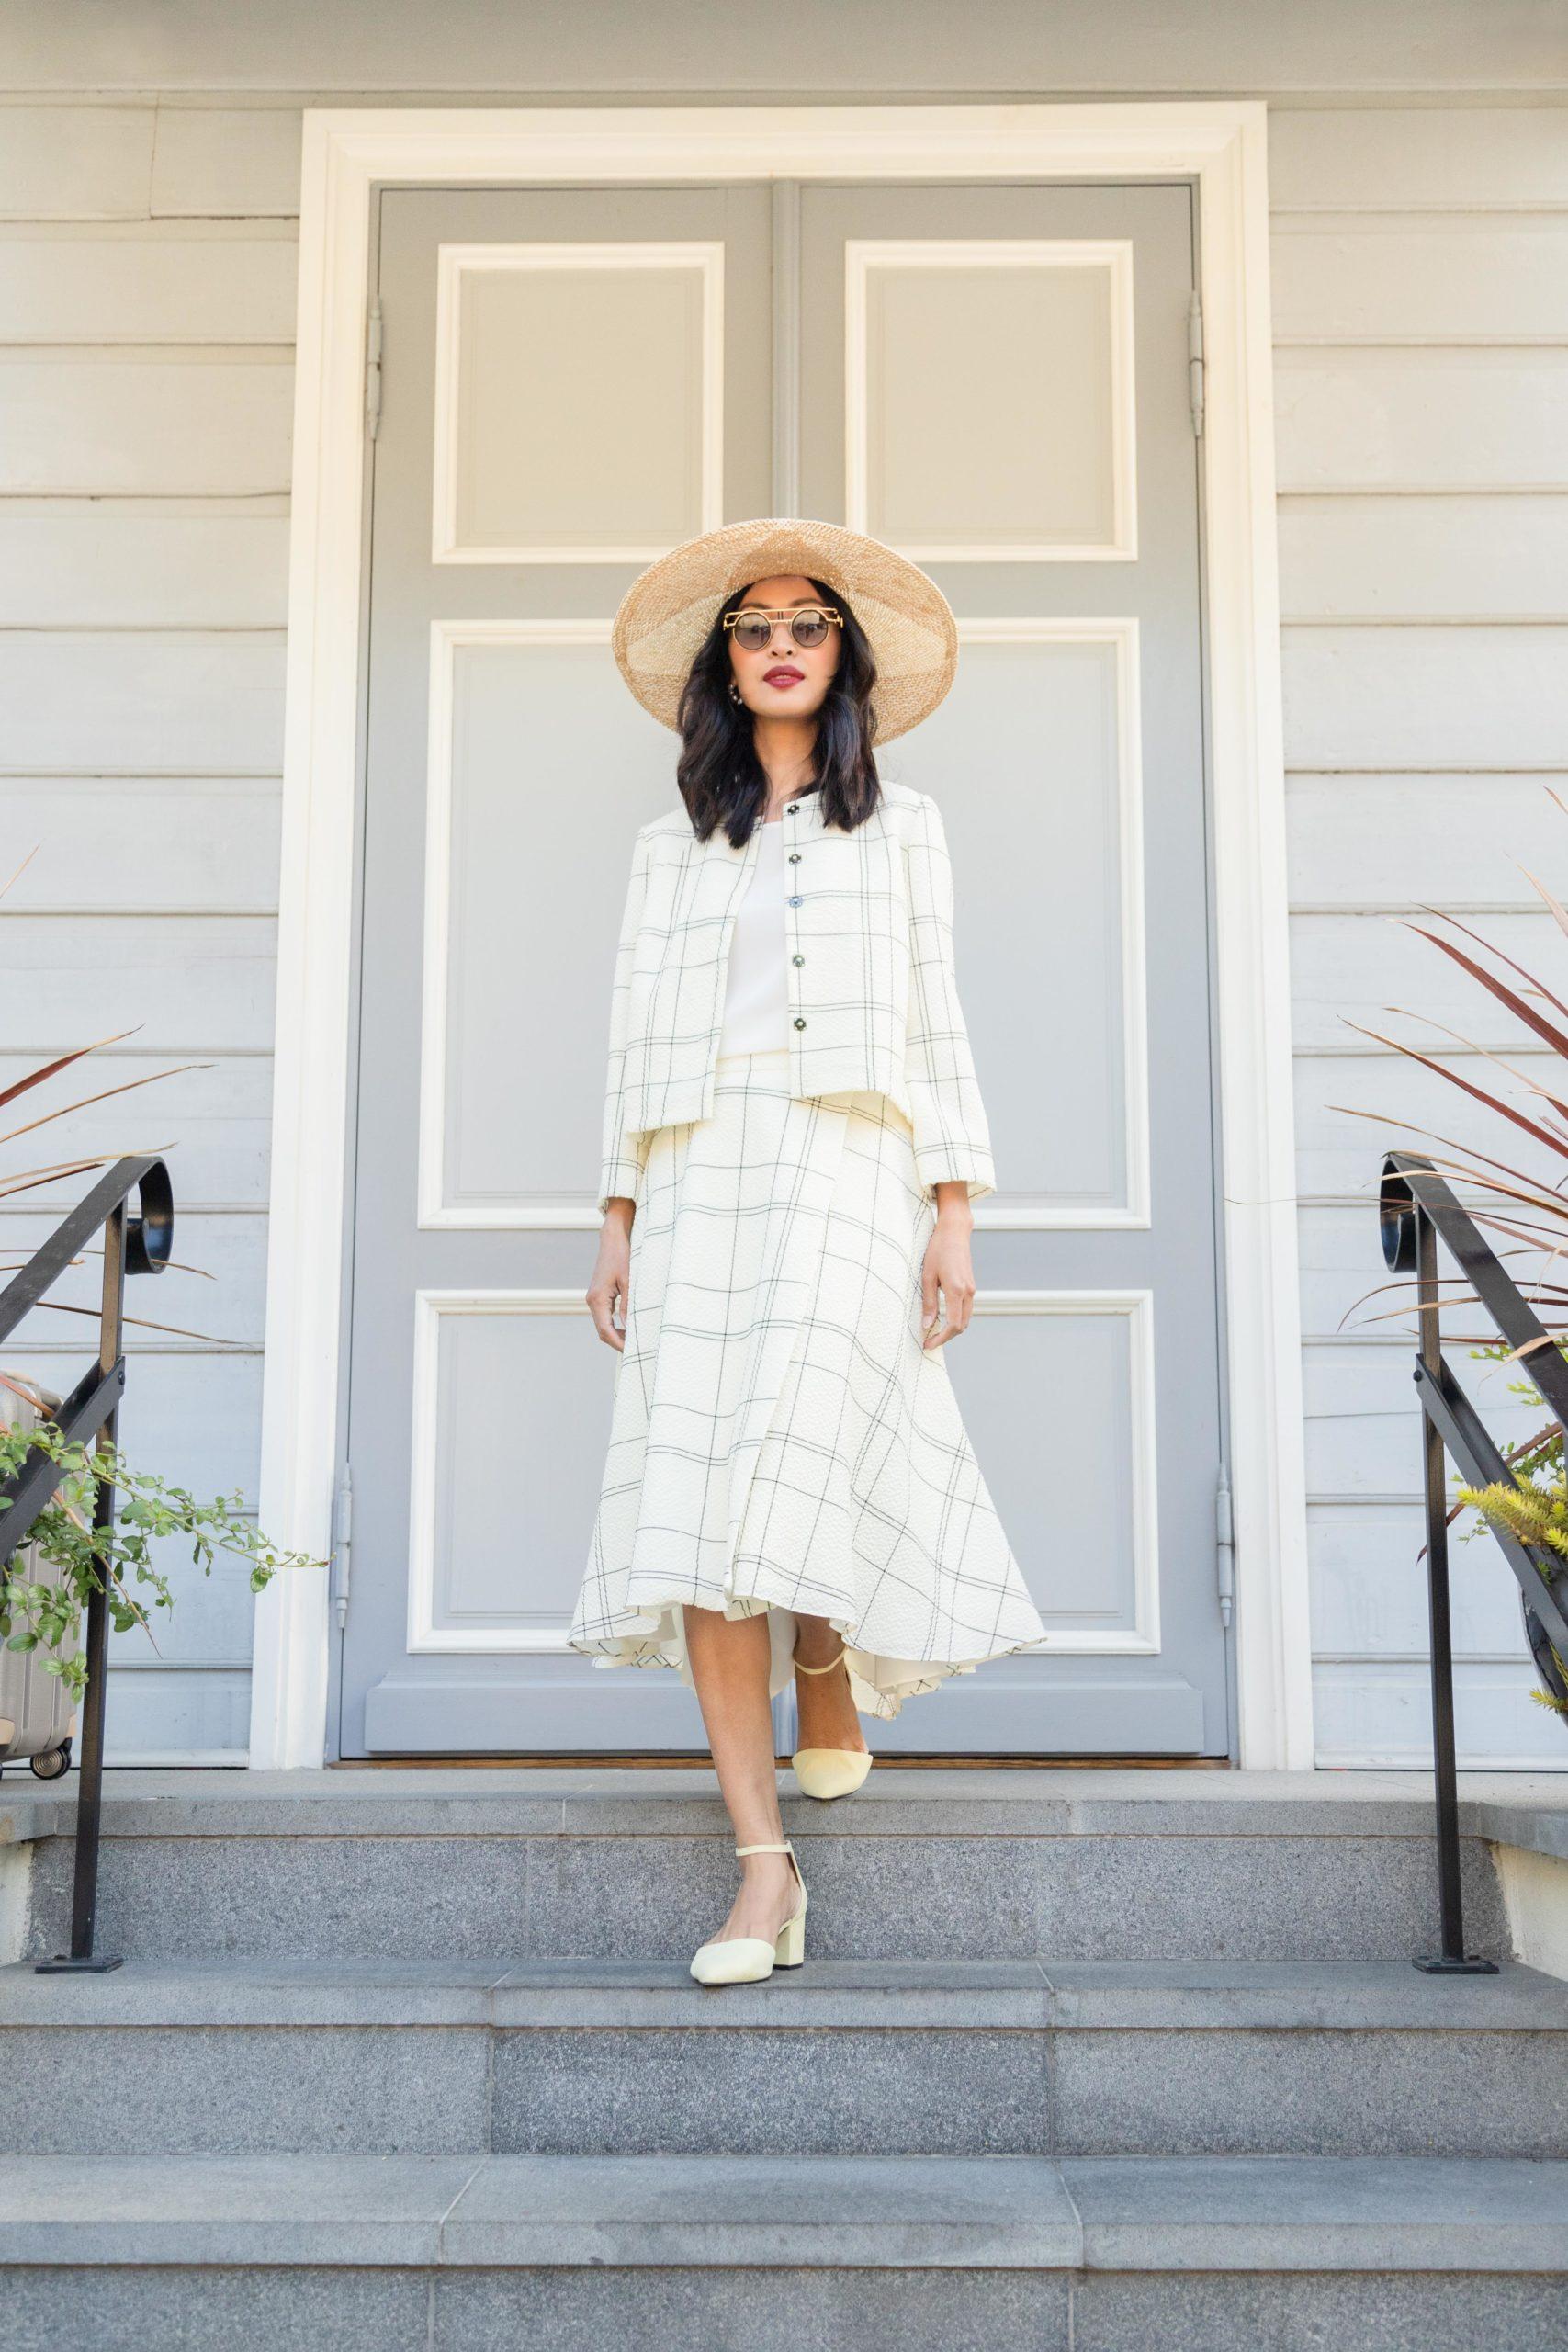 J H E N N for Marimo Fashion